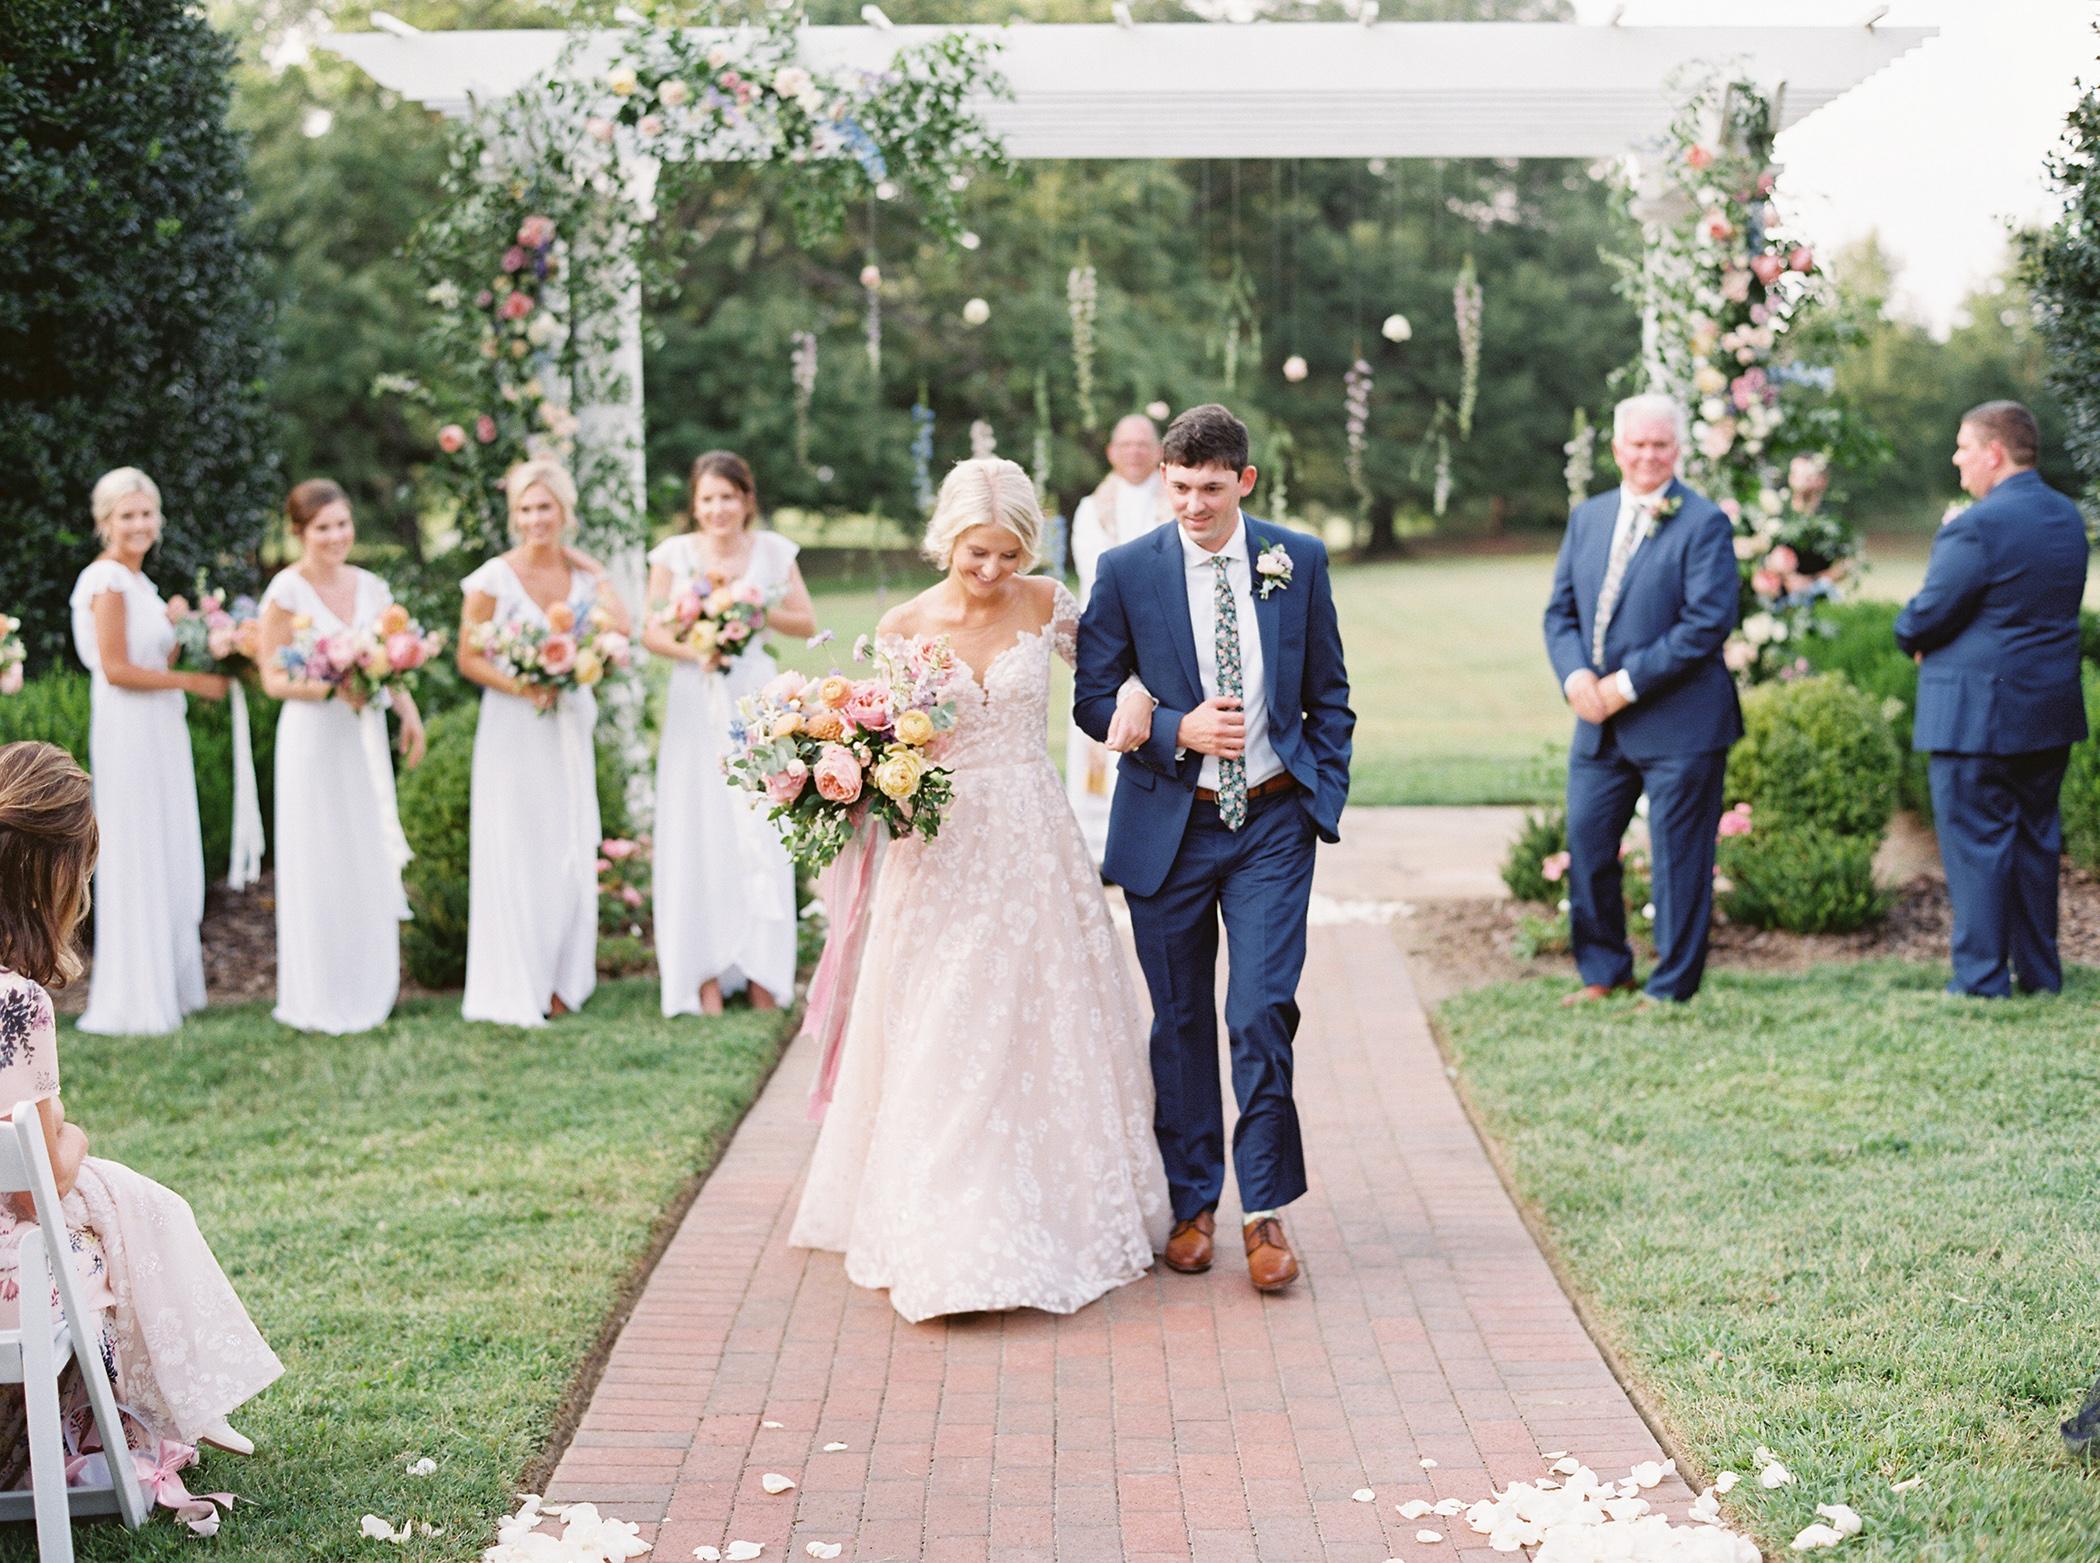 shelby preston wedding ceremony couple